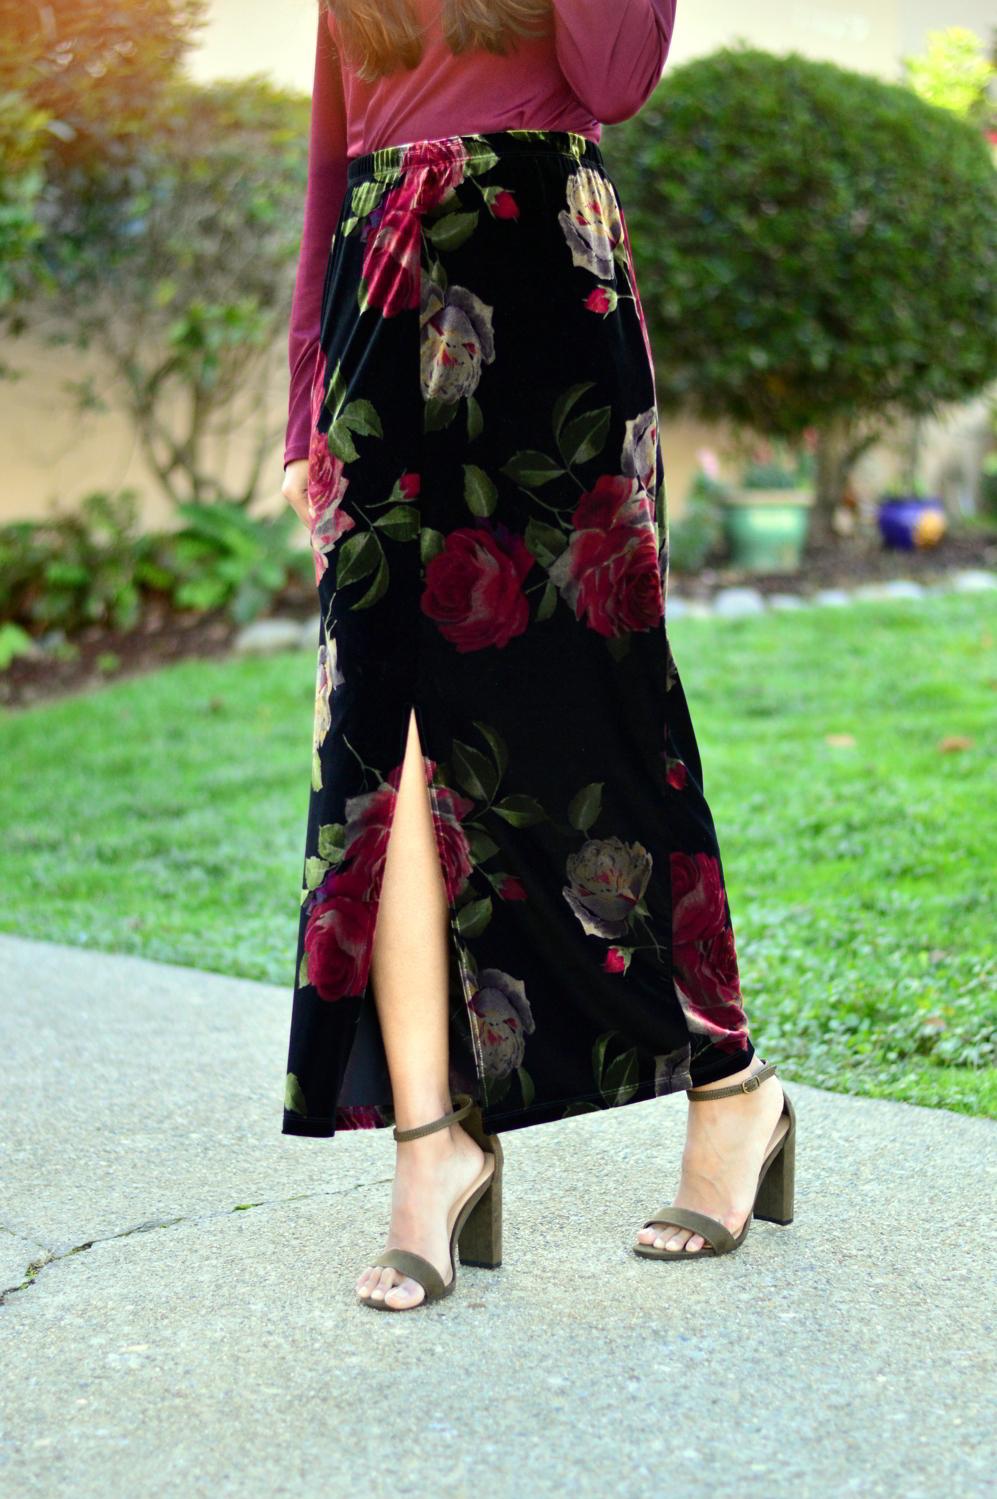 velvet-floral-skirt-choker-burgundy-top-party-outfit-NYE-blogger 8